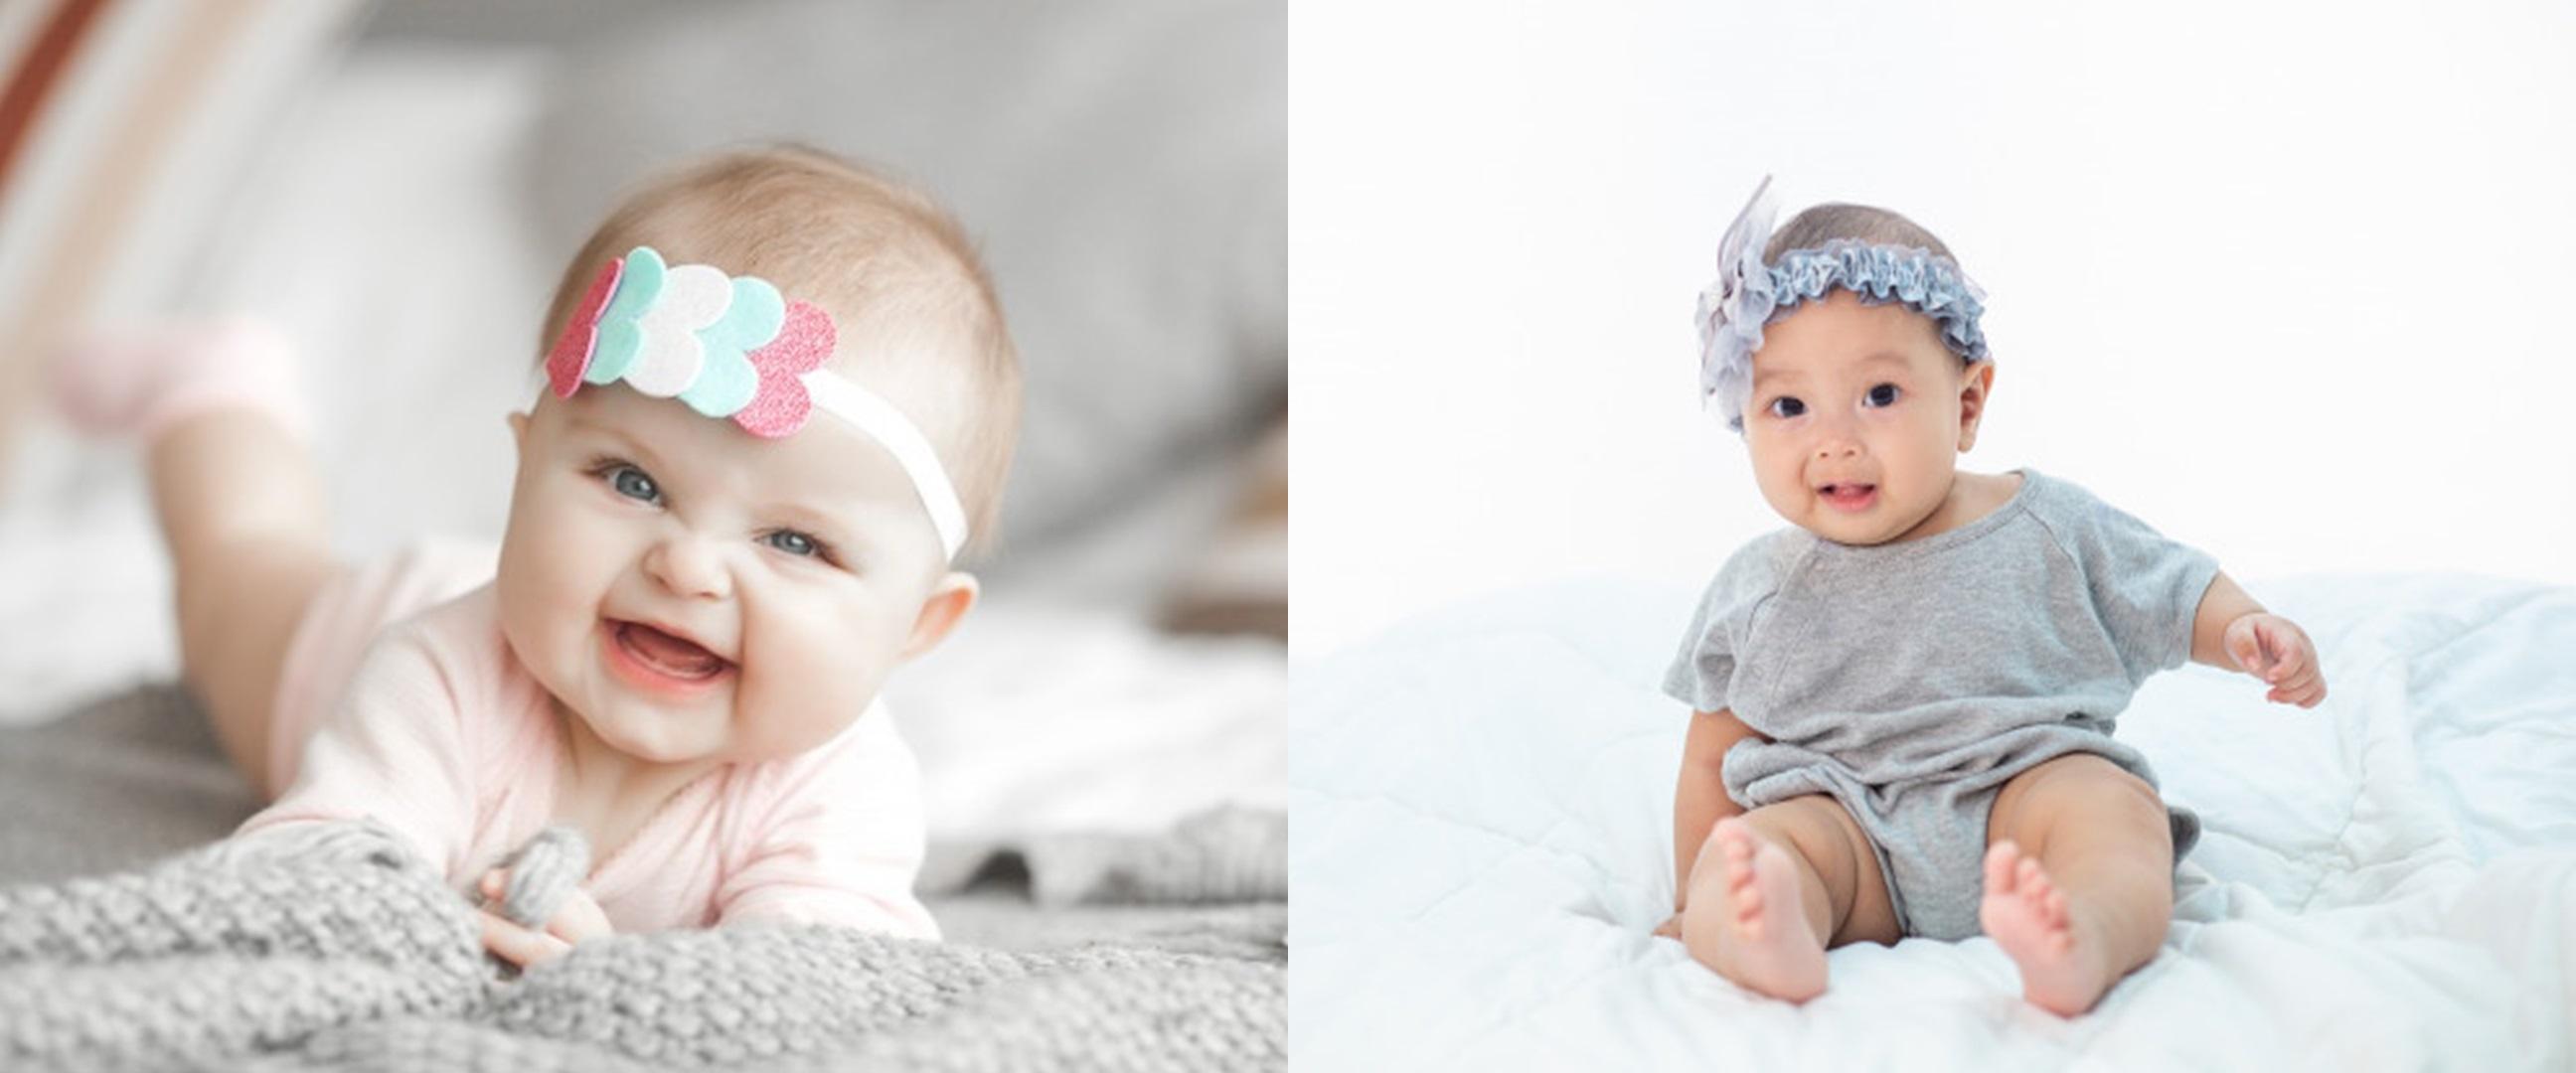 88 Nama bayi perempuan bermakna cantik dan indah